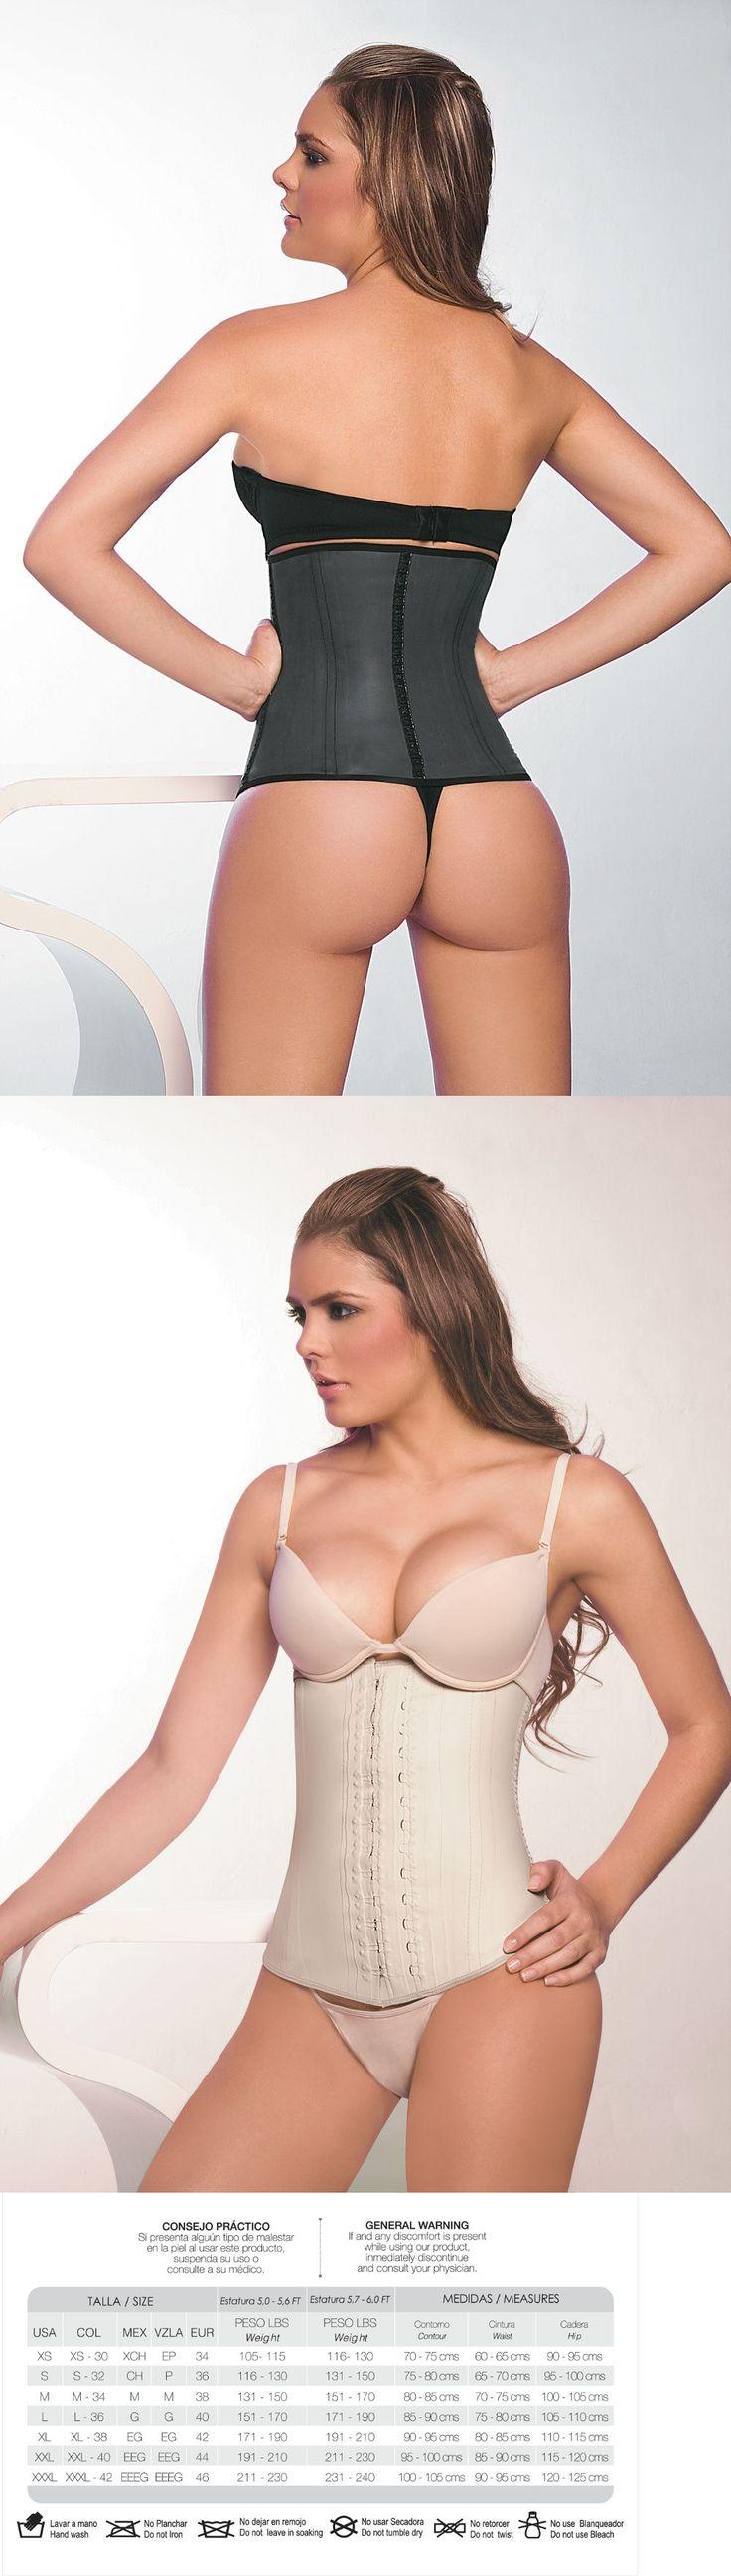 Other Weight Management: Ann Chery 2025 Latex Girdle Sport Waist Cincher, Shapewear Faja Deportiva BUY IT NOW ONLY: $36.0